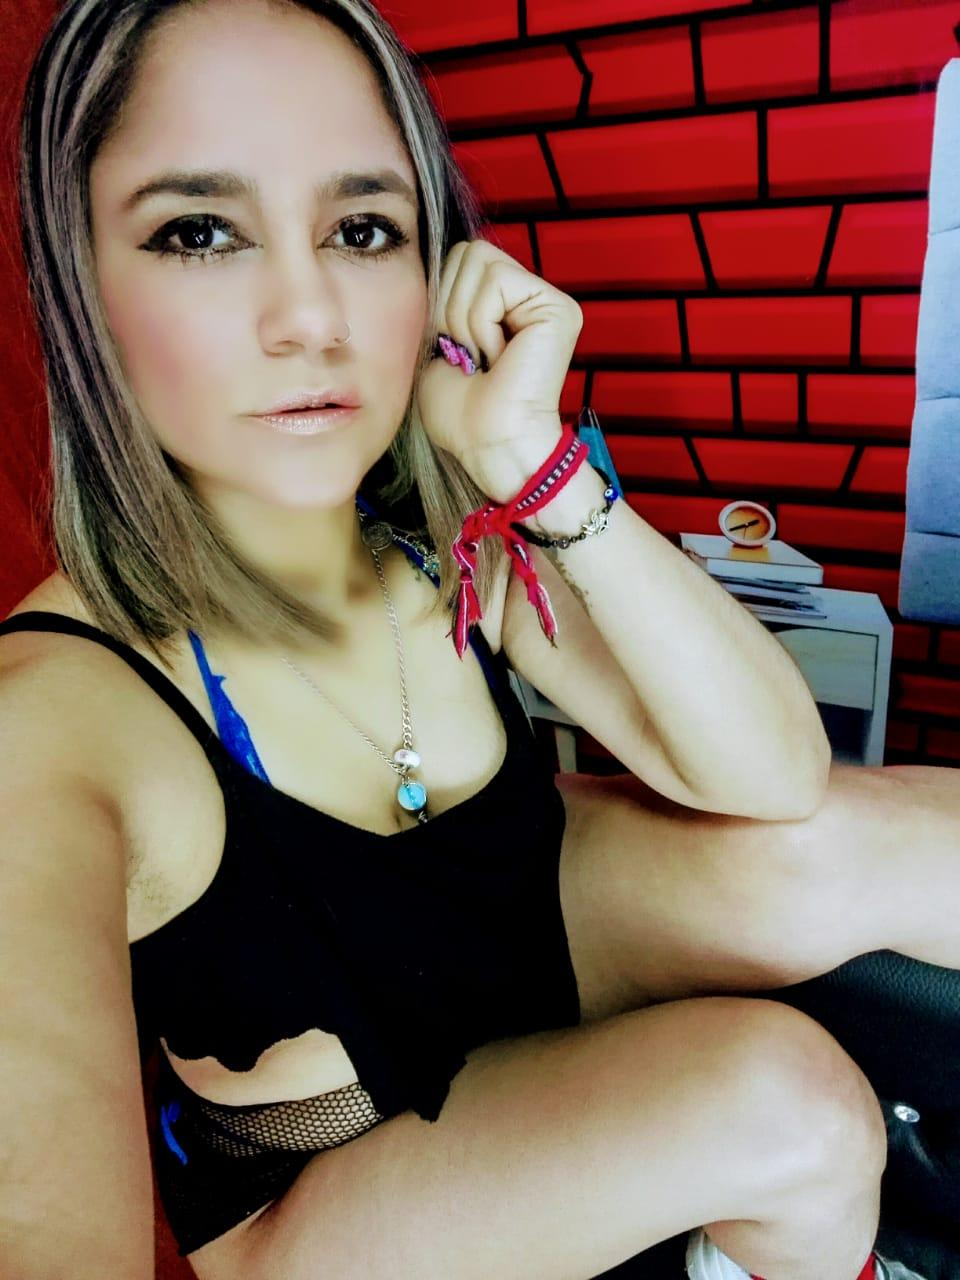 Camila rivero?s=4yn7xh0vvn0znkctfaoisr6ecss1muayweal1hbaenc=